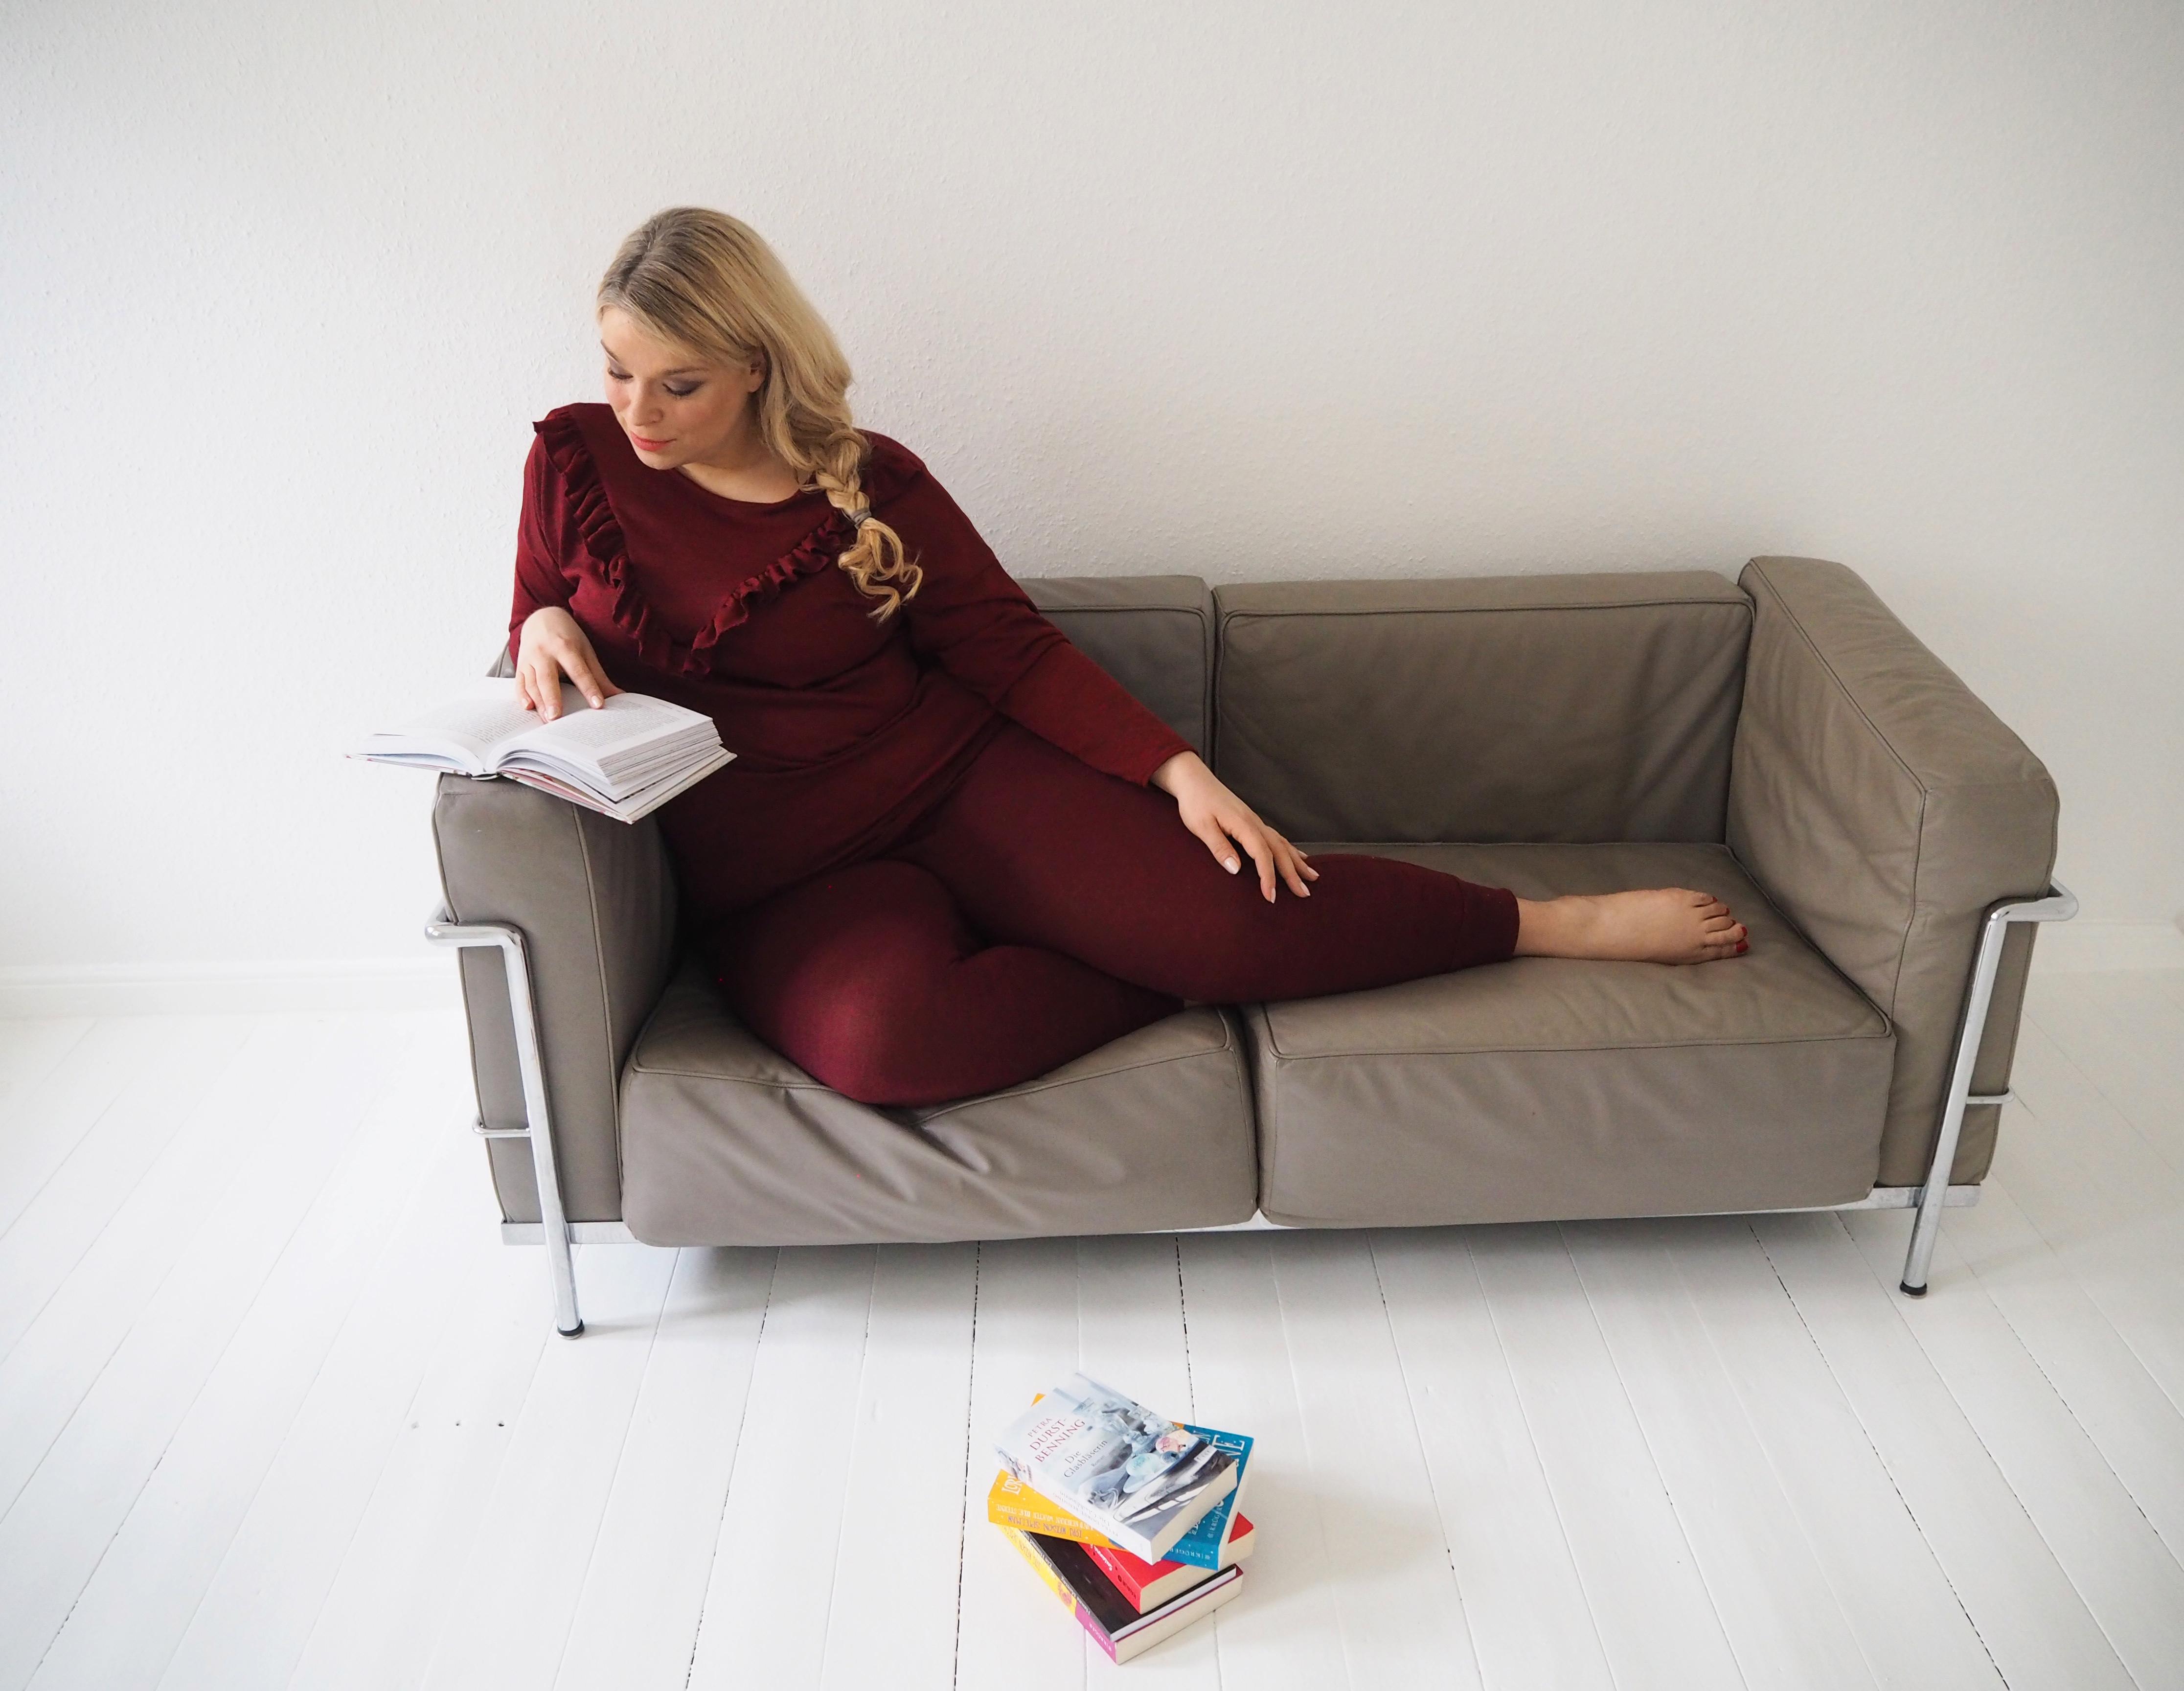 Megabambi-caterina-bloggerin-Einrichtung-curvy-homewear